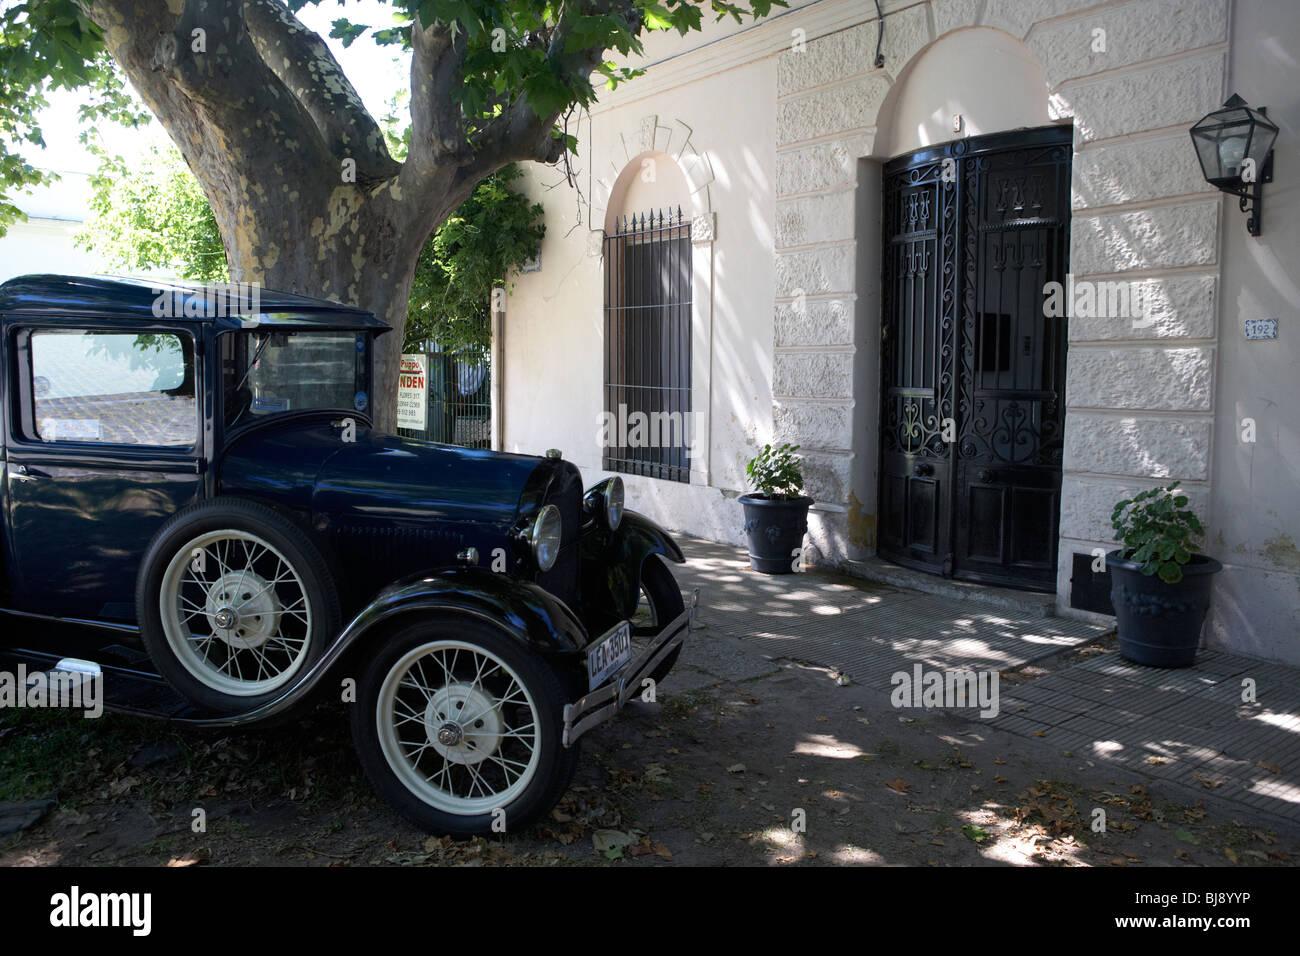 Auto World Vintage Car Museum Stock Photos & Auto World Vintage Car ...